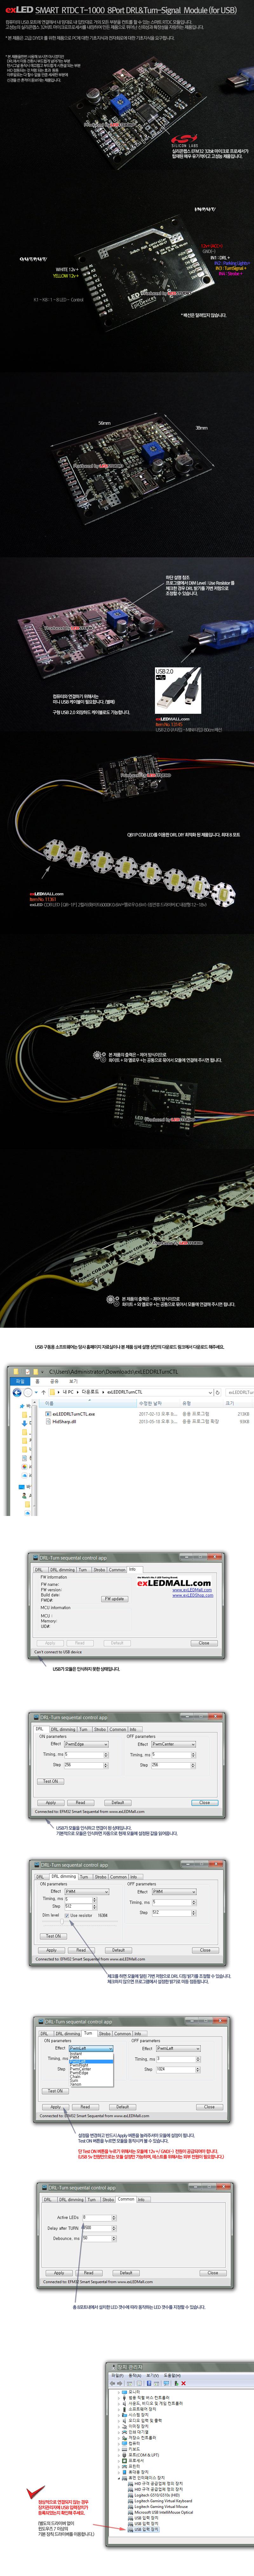 exLED 스마트 RTDC 8포트 T-1000 DRL & 시퀀셜 턴시그널 제어 모듈  (1PCS-낱개1개) USB 제어